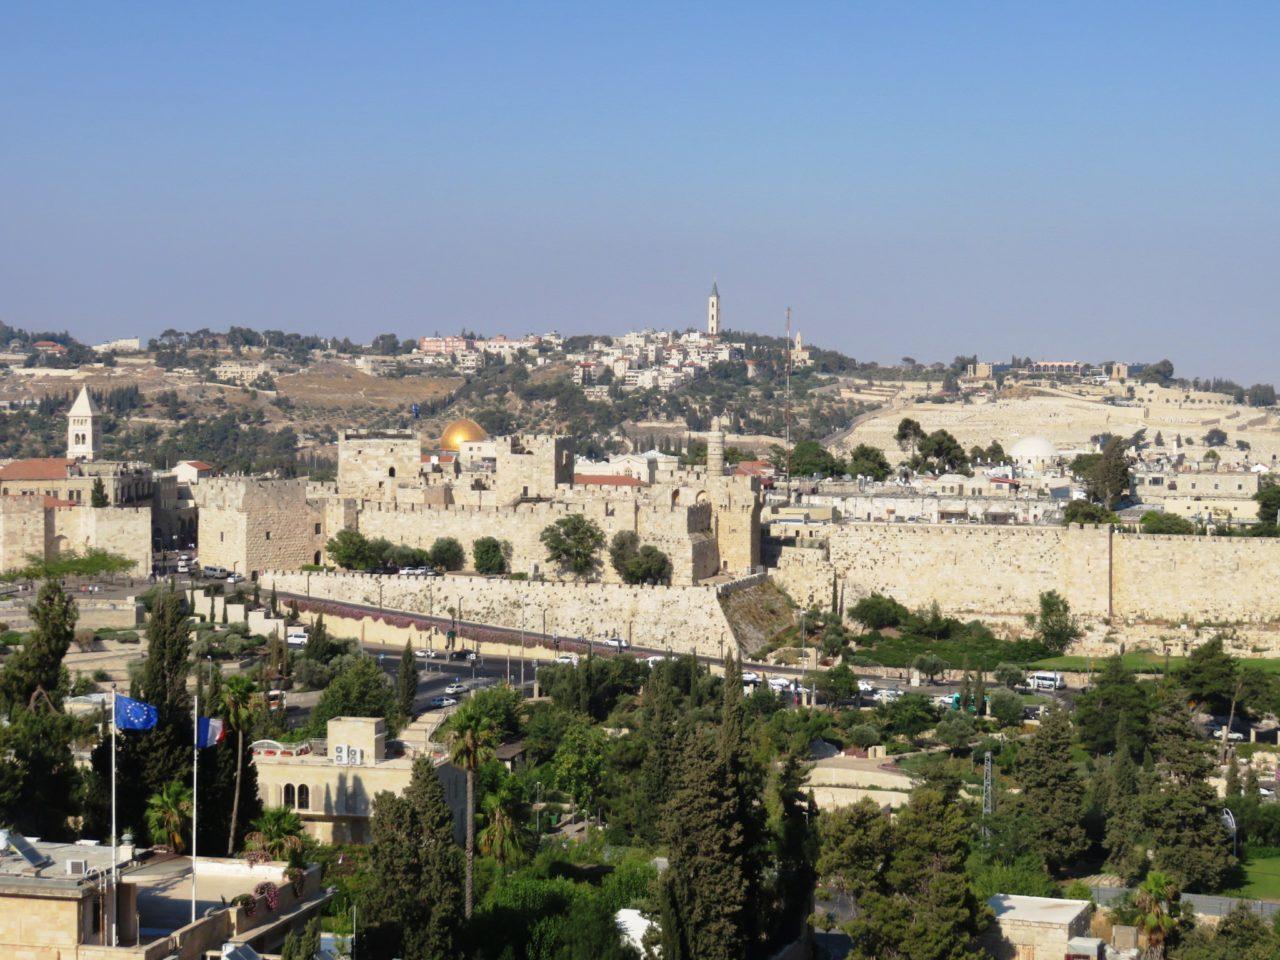 King David Hotel, Jerusalem Israel - View of old city of Jerusalem and Mount of Olives from King David Hotel